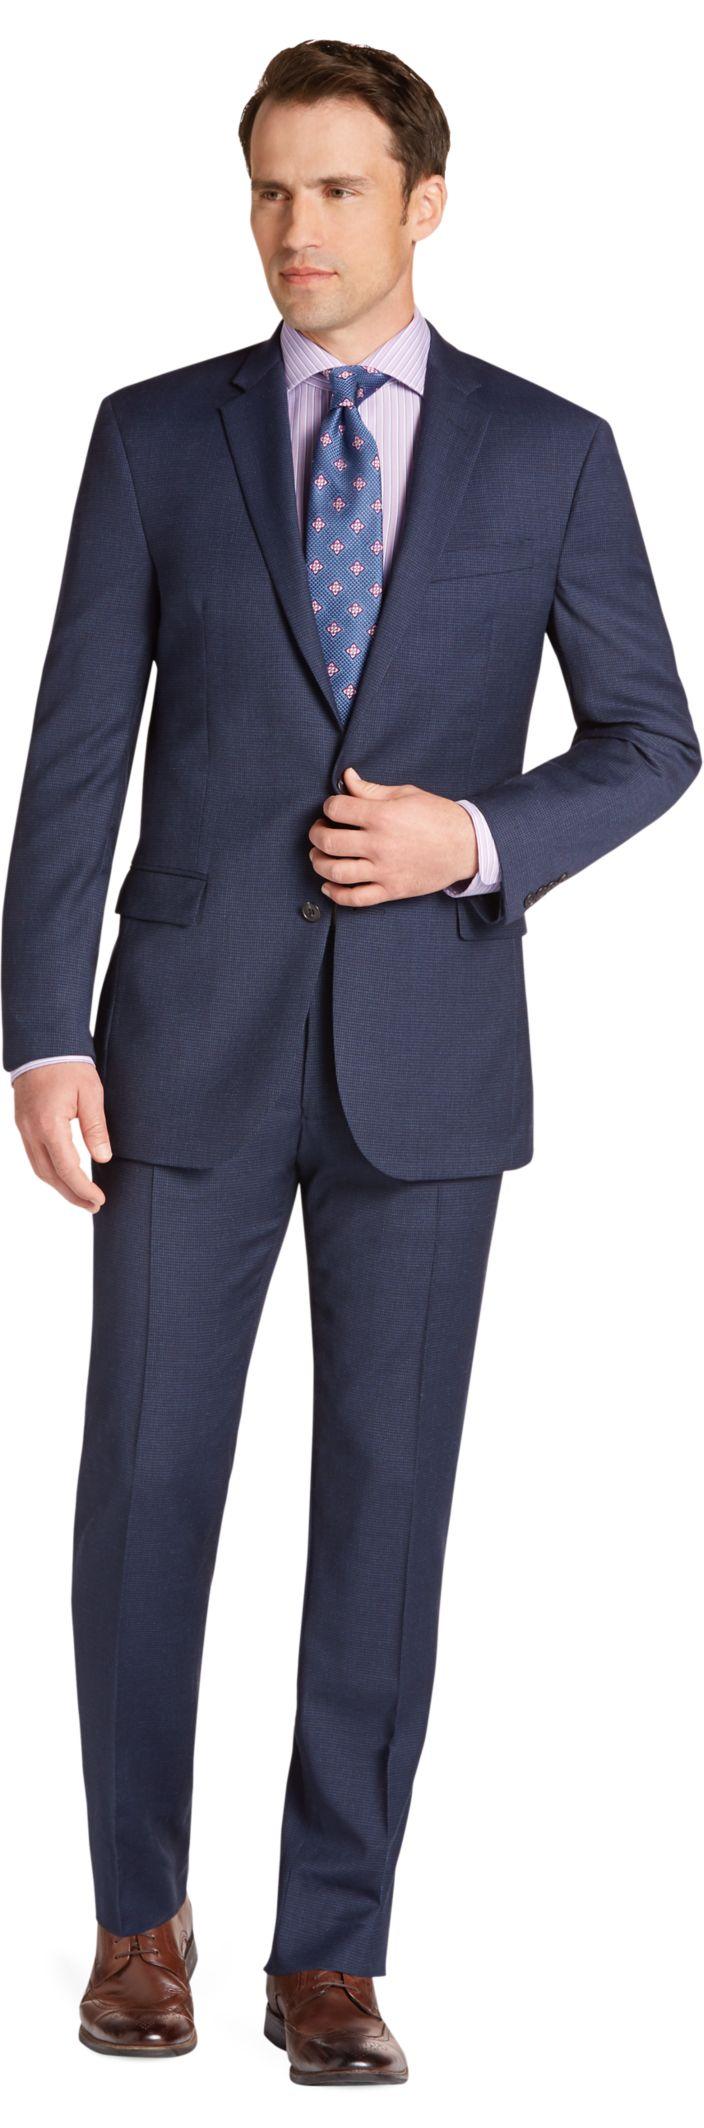 slim fit suits menu0027s suits, 1905 collection slim fit mini check suit - jos a bank EPEDSOC